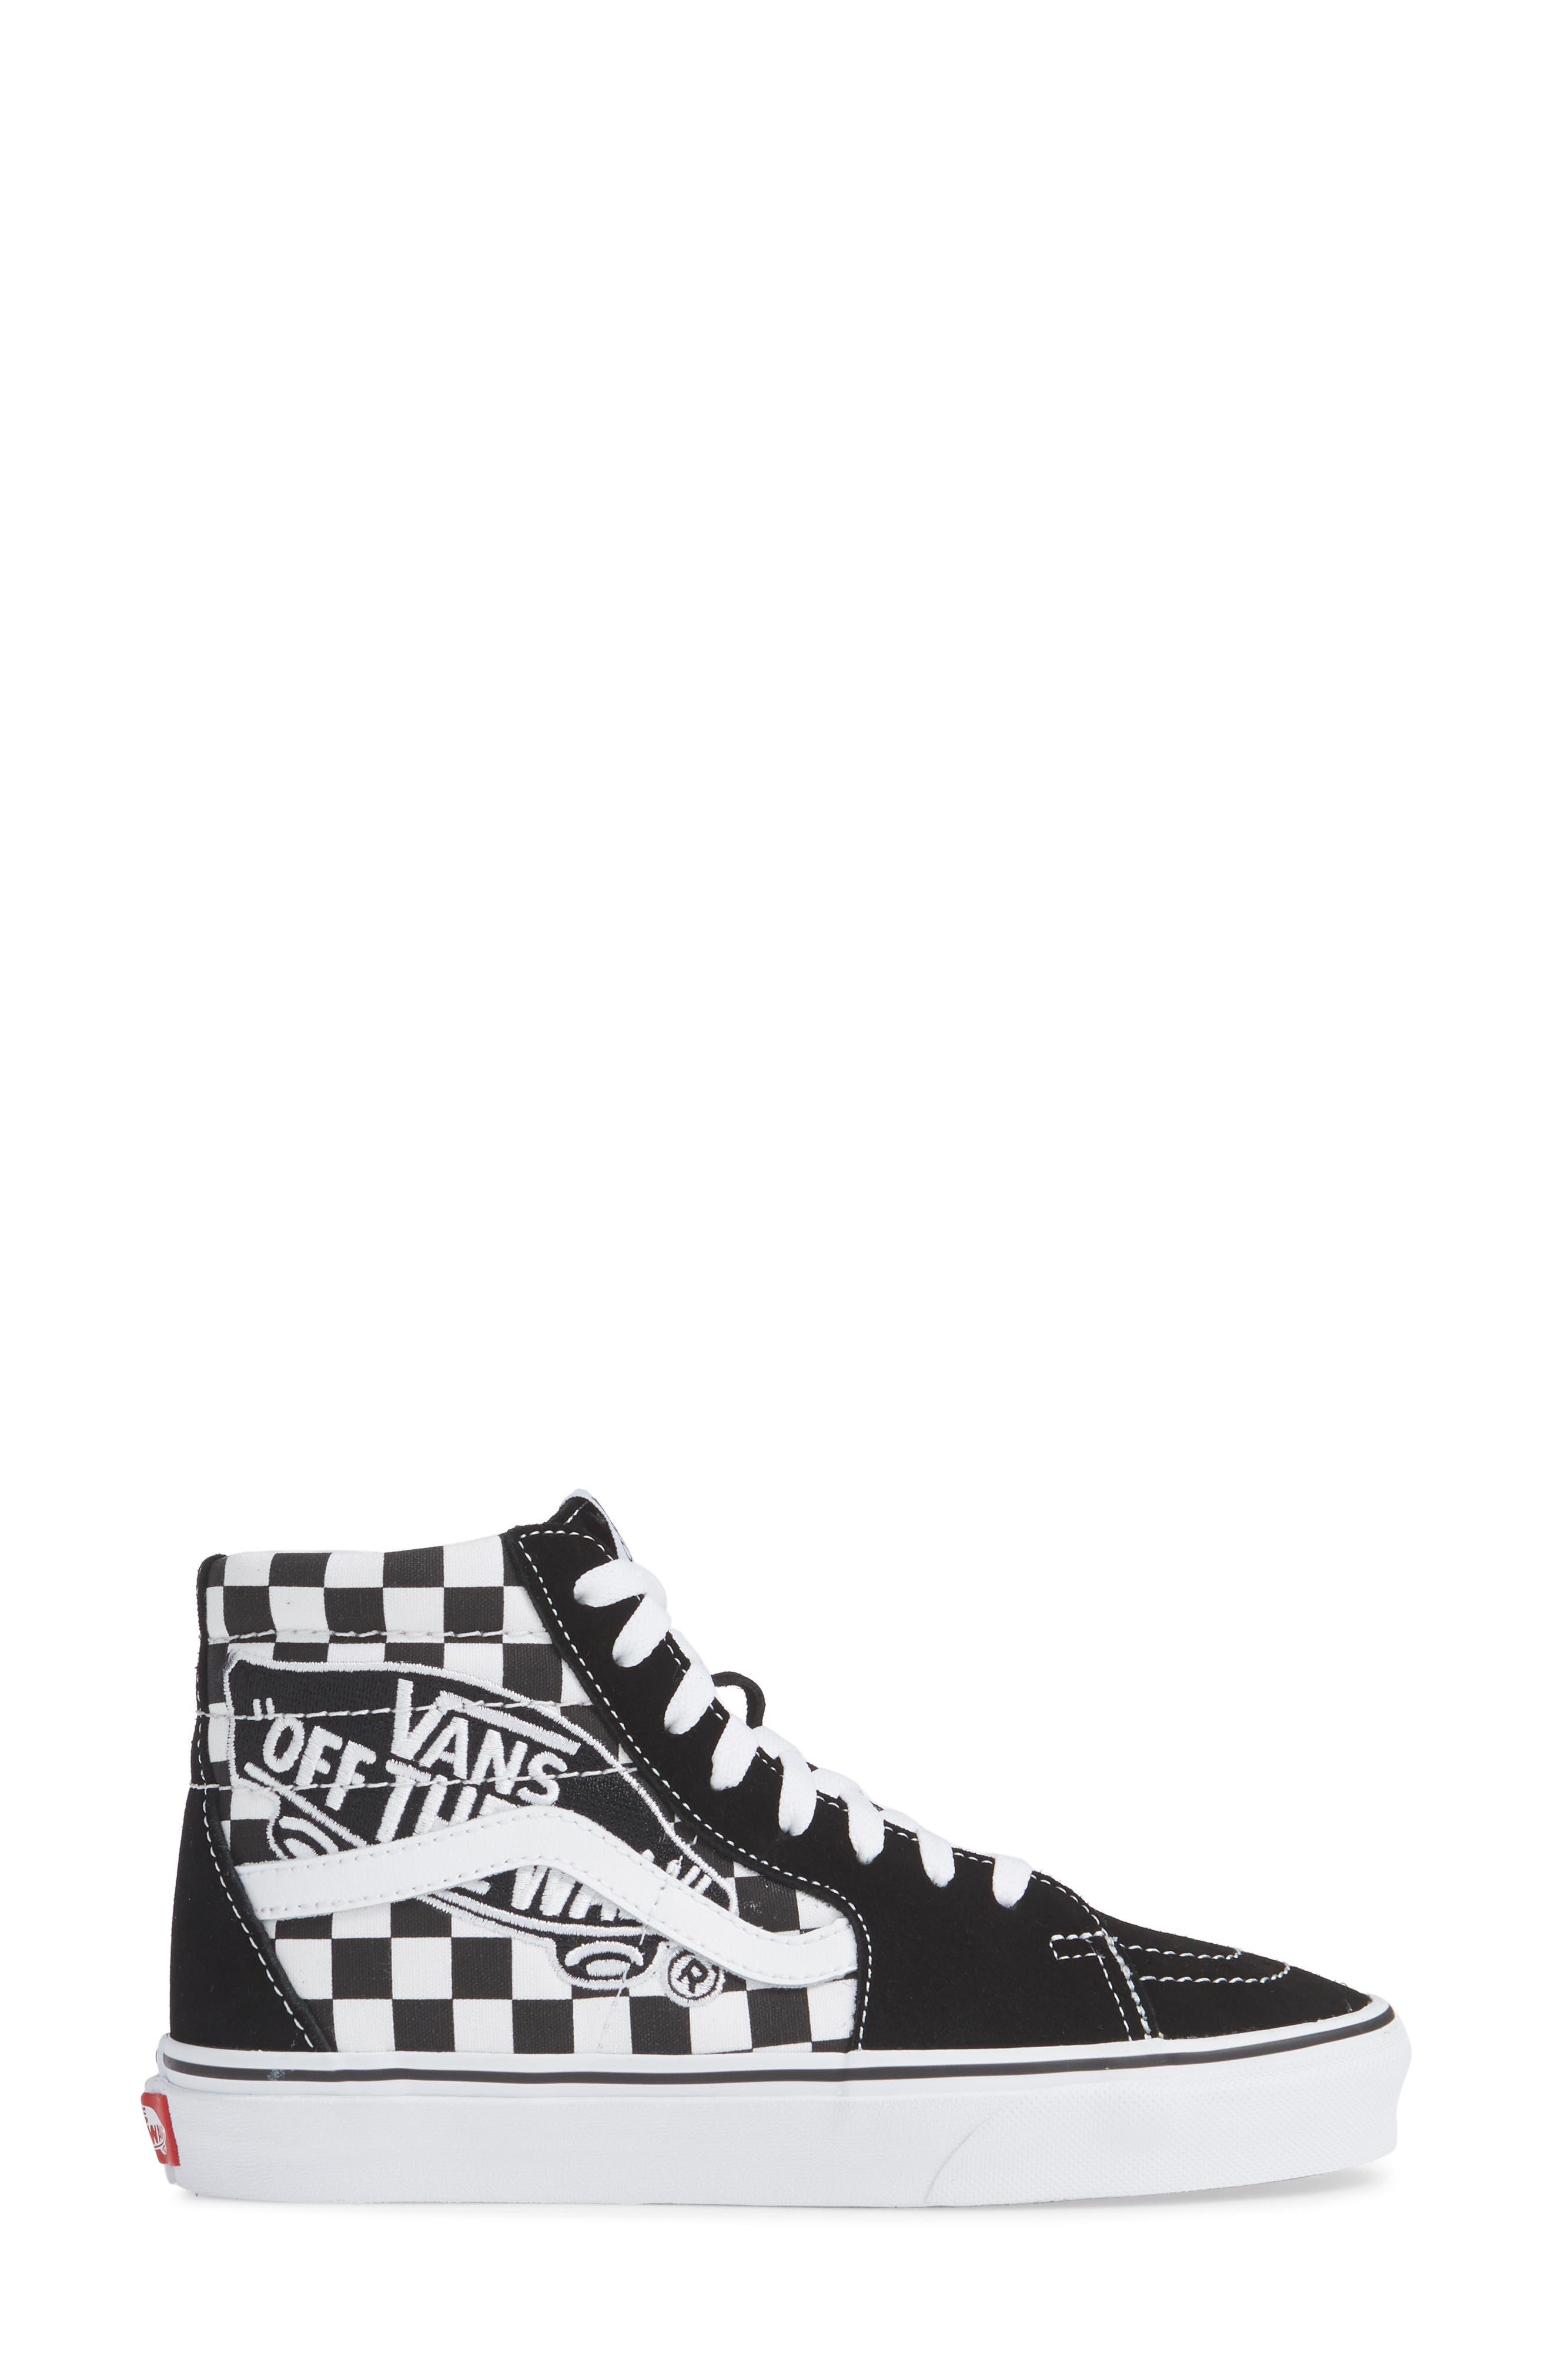 Sk8-Hi Patch High Top Sneaker,                             Alternate thumbnail 3, color,                             BLACK/ TRUE WHITE